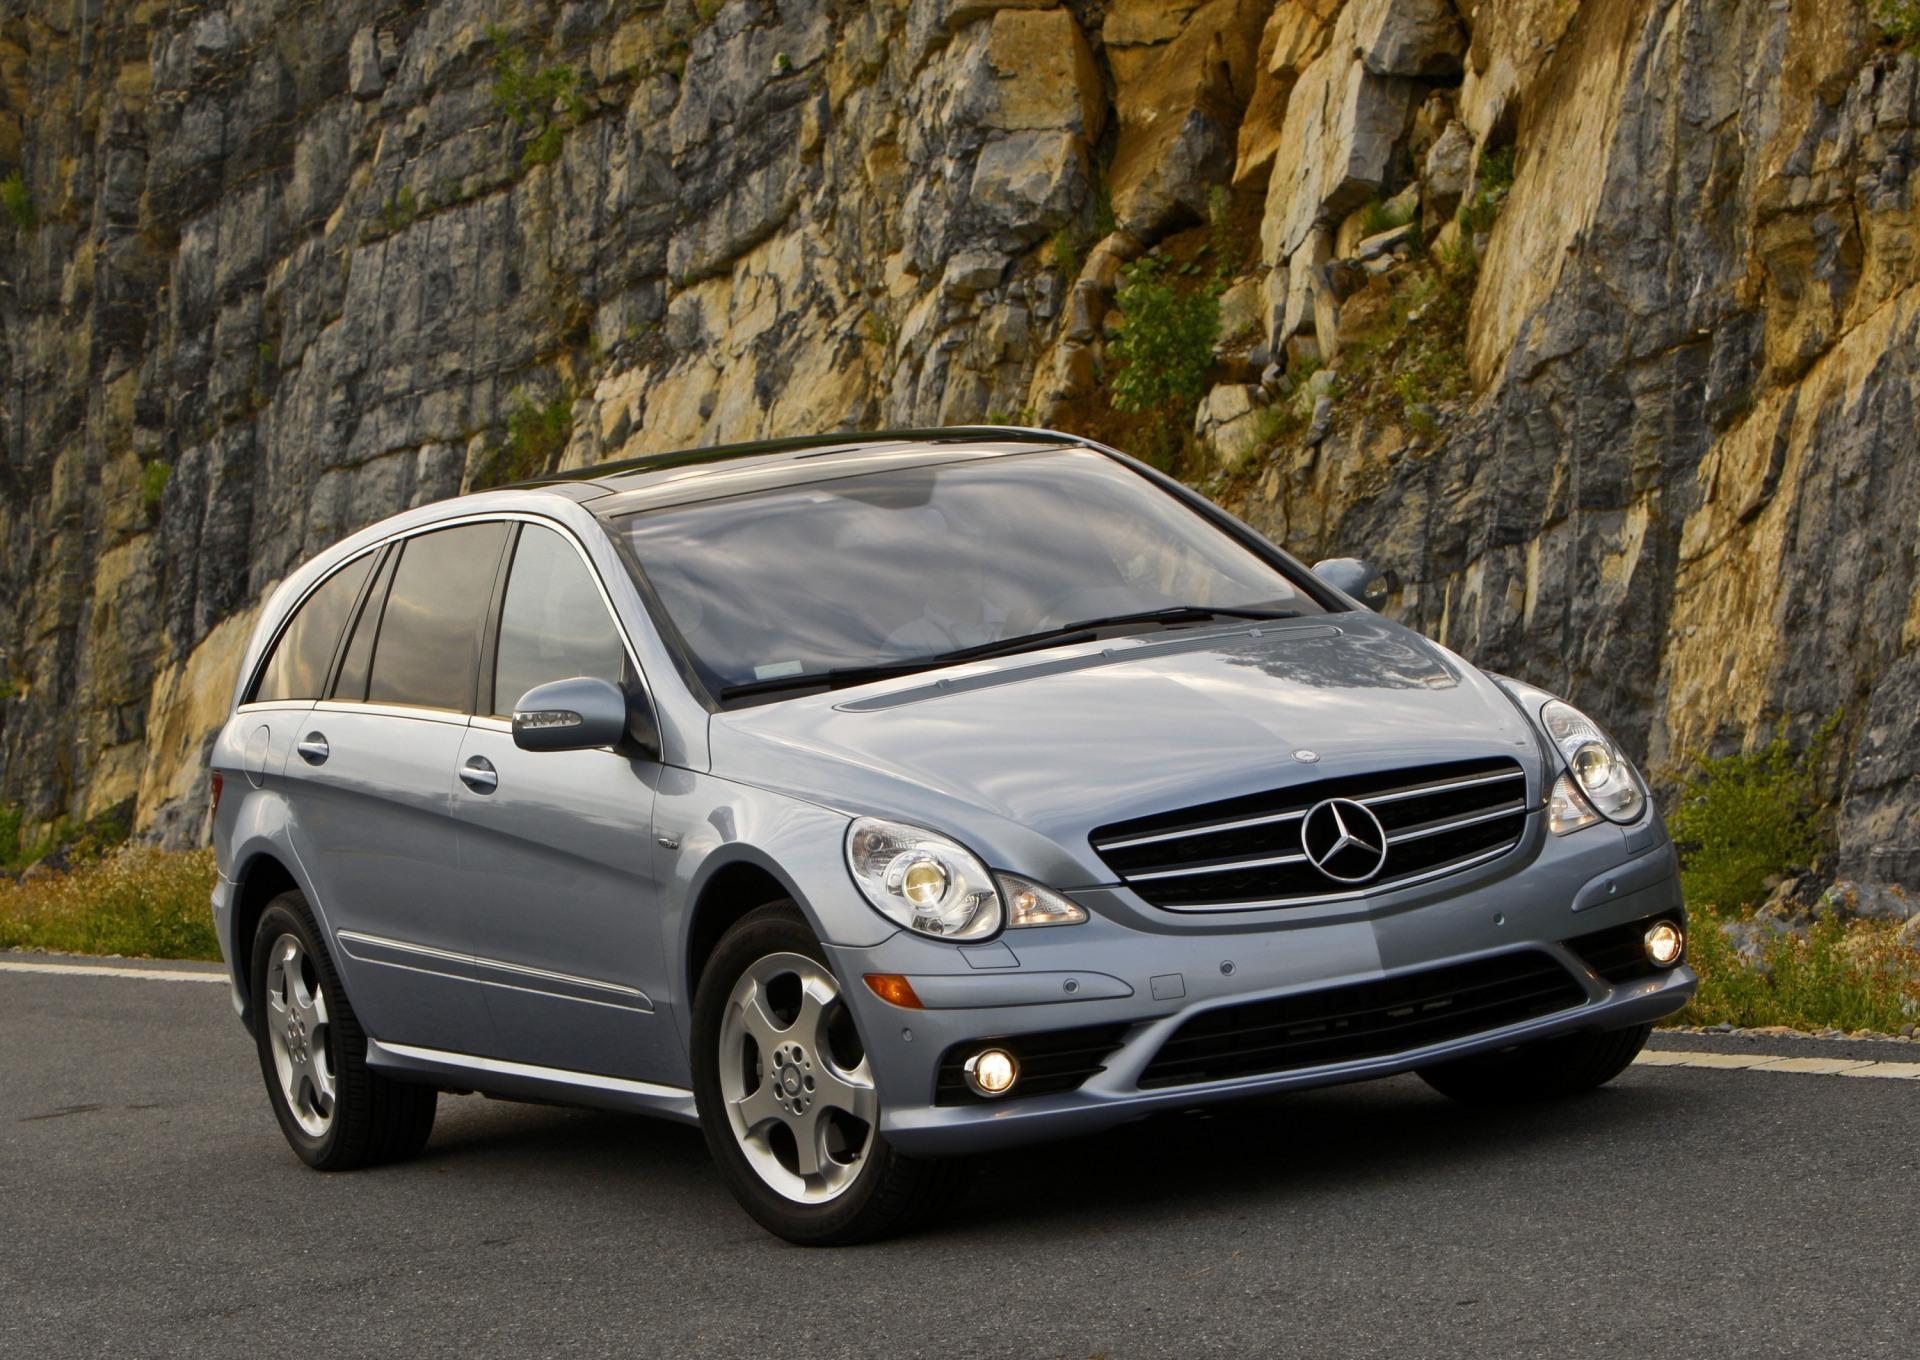 2010 Mercedes Benz R Class News And Information